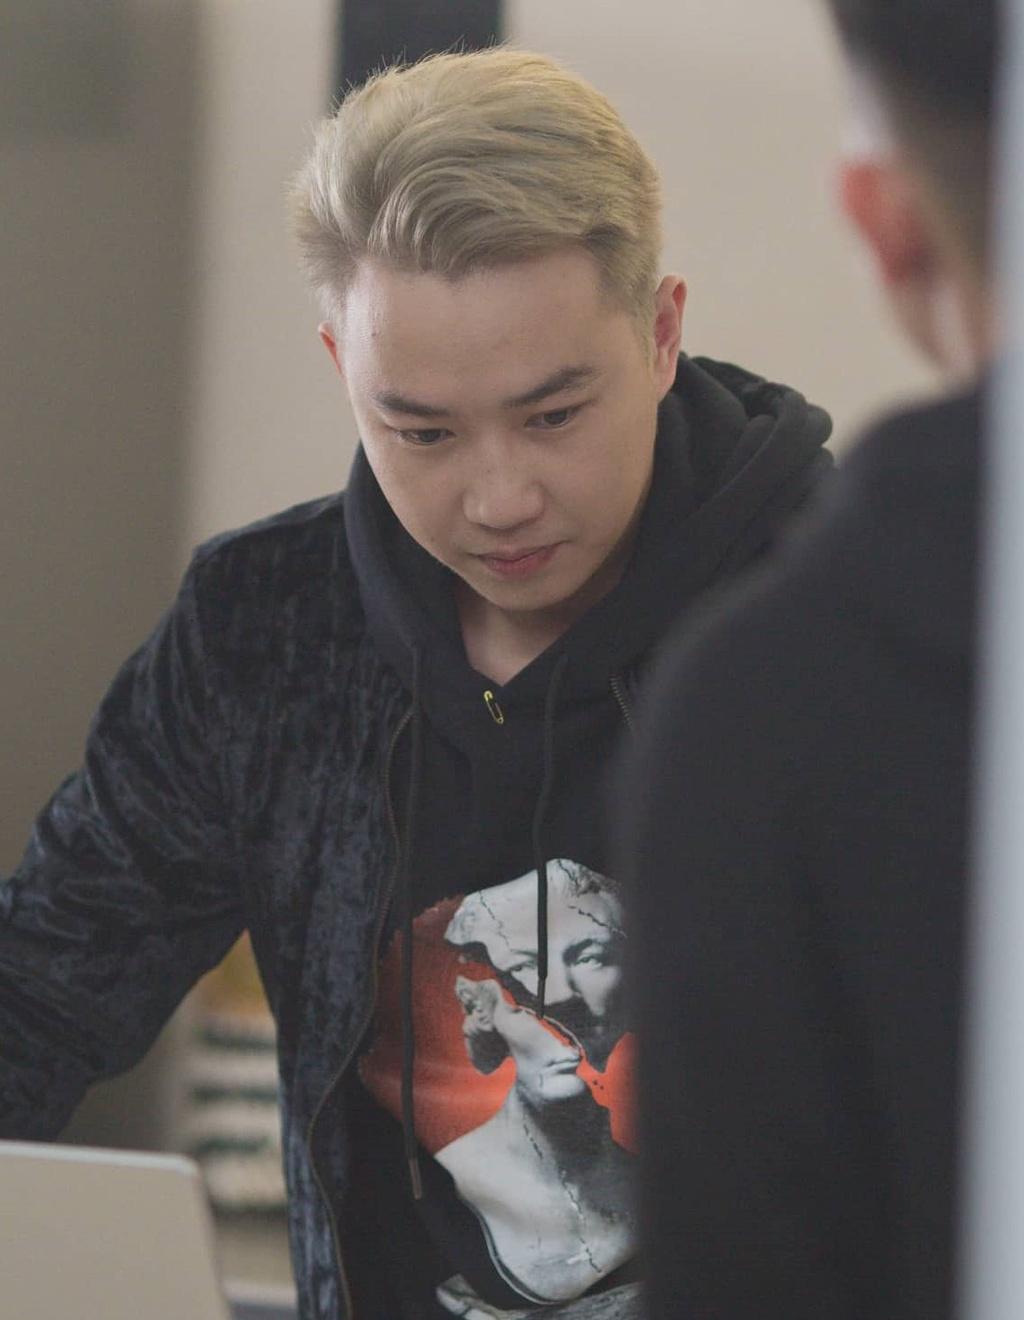 'Mong muon Tao Quan 2019 co format moi, nhung khong dam y kien gi' hinh anh 2